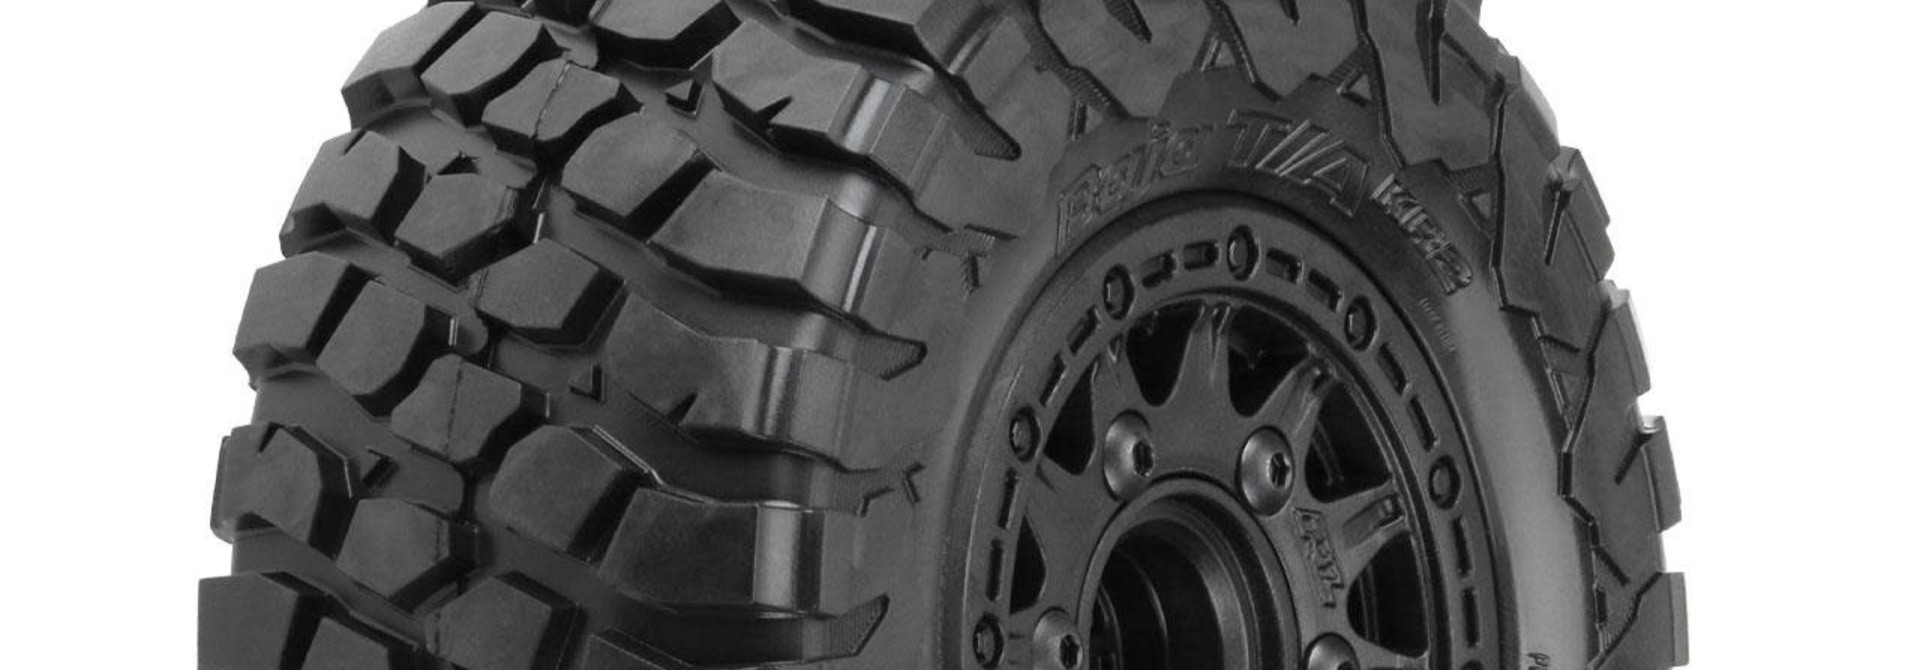 "BFGoodrich Baja T/A KR2 SC 2.2""/3.0"" M2 (Medium) All Terrain Tires Mounted on Raid Black, PR10123-10"